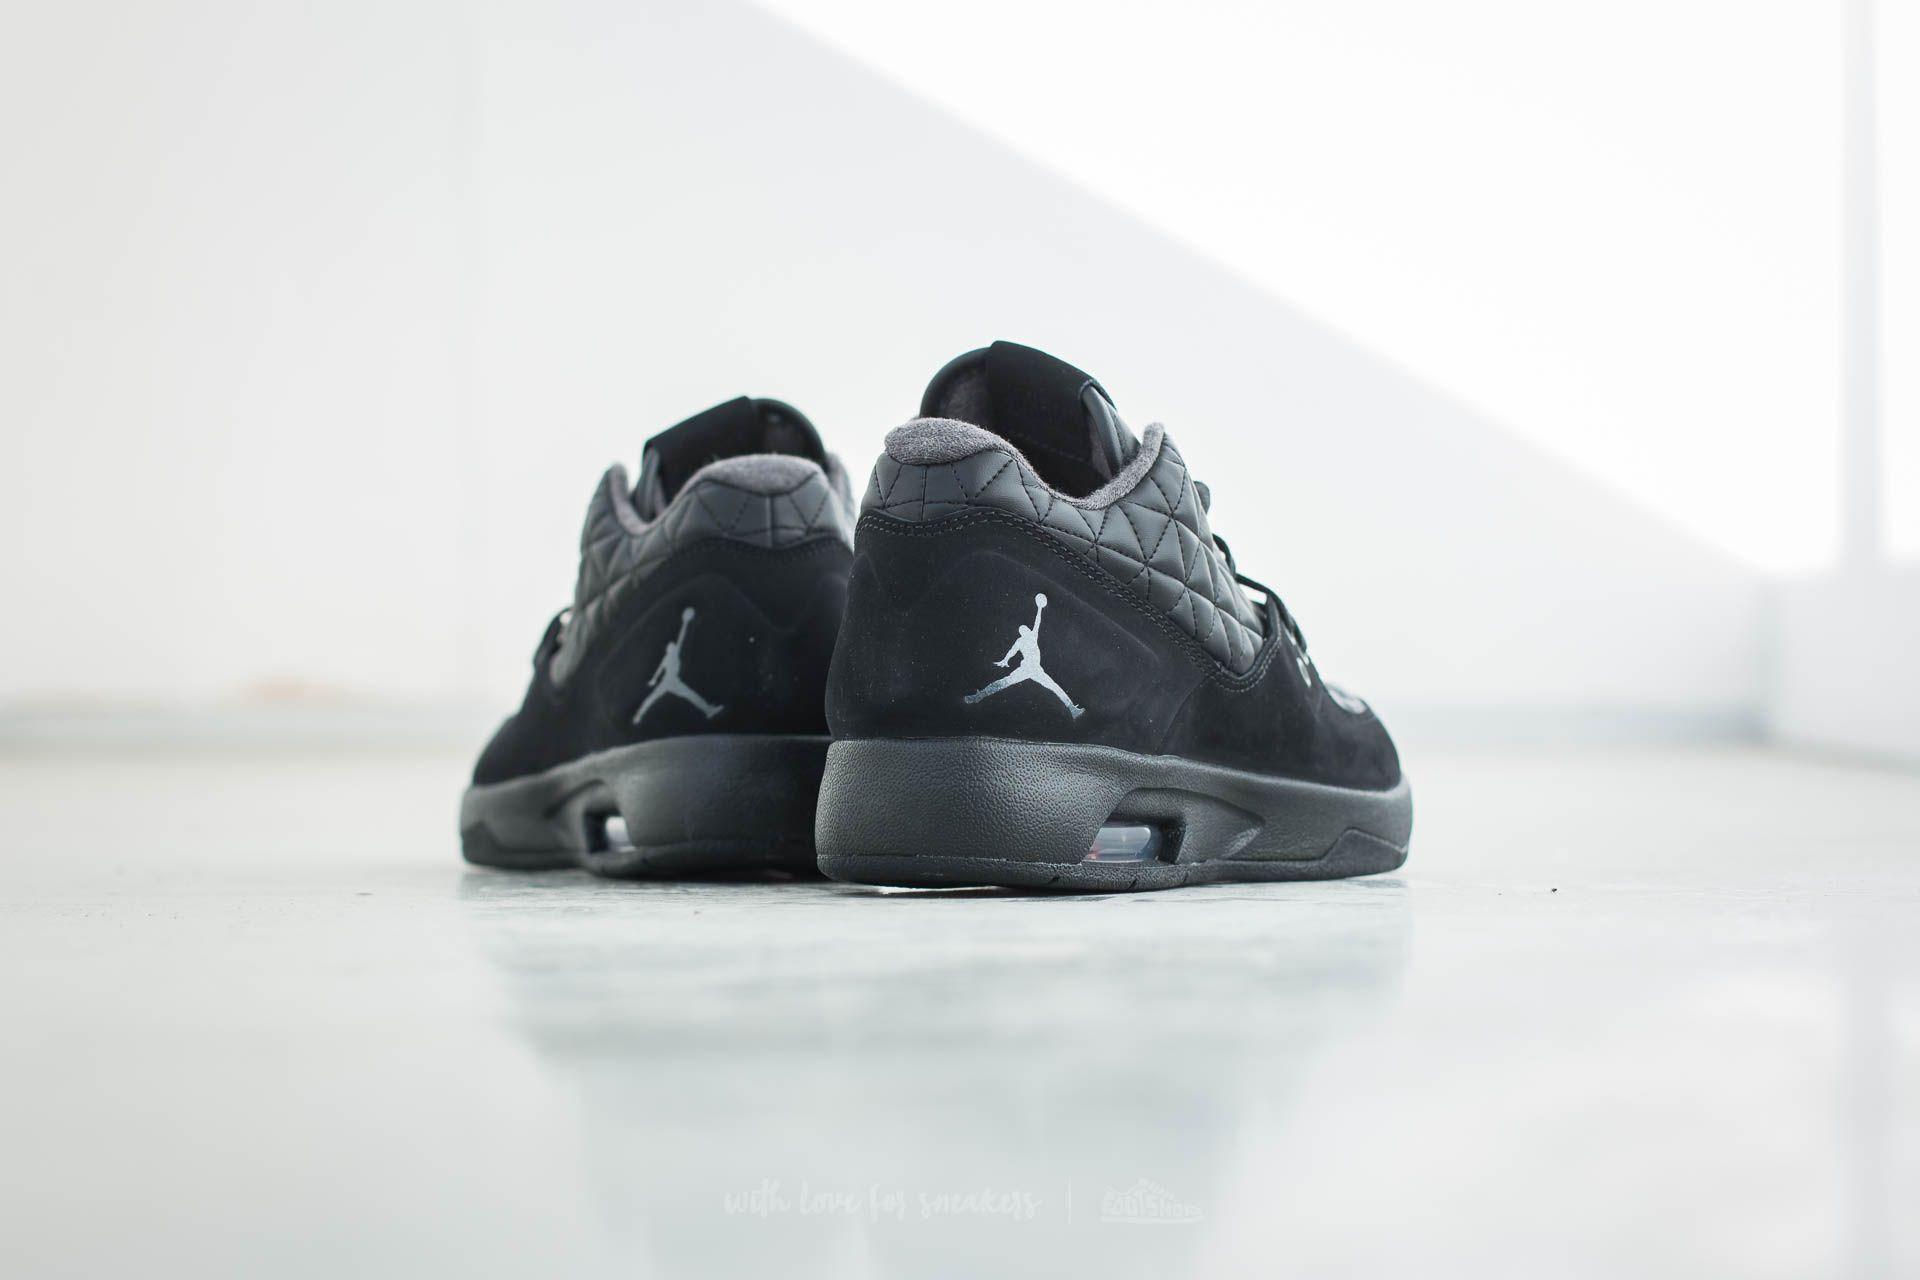 Black Gym Black Gym Jordan Clutch Jordan Clutch RedFootshop trdCQxBosh